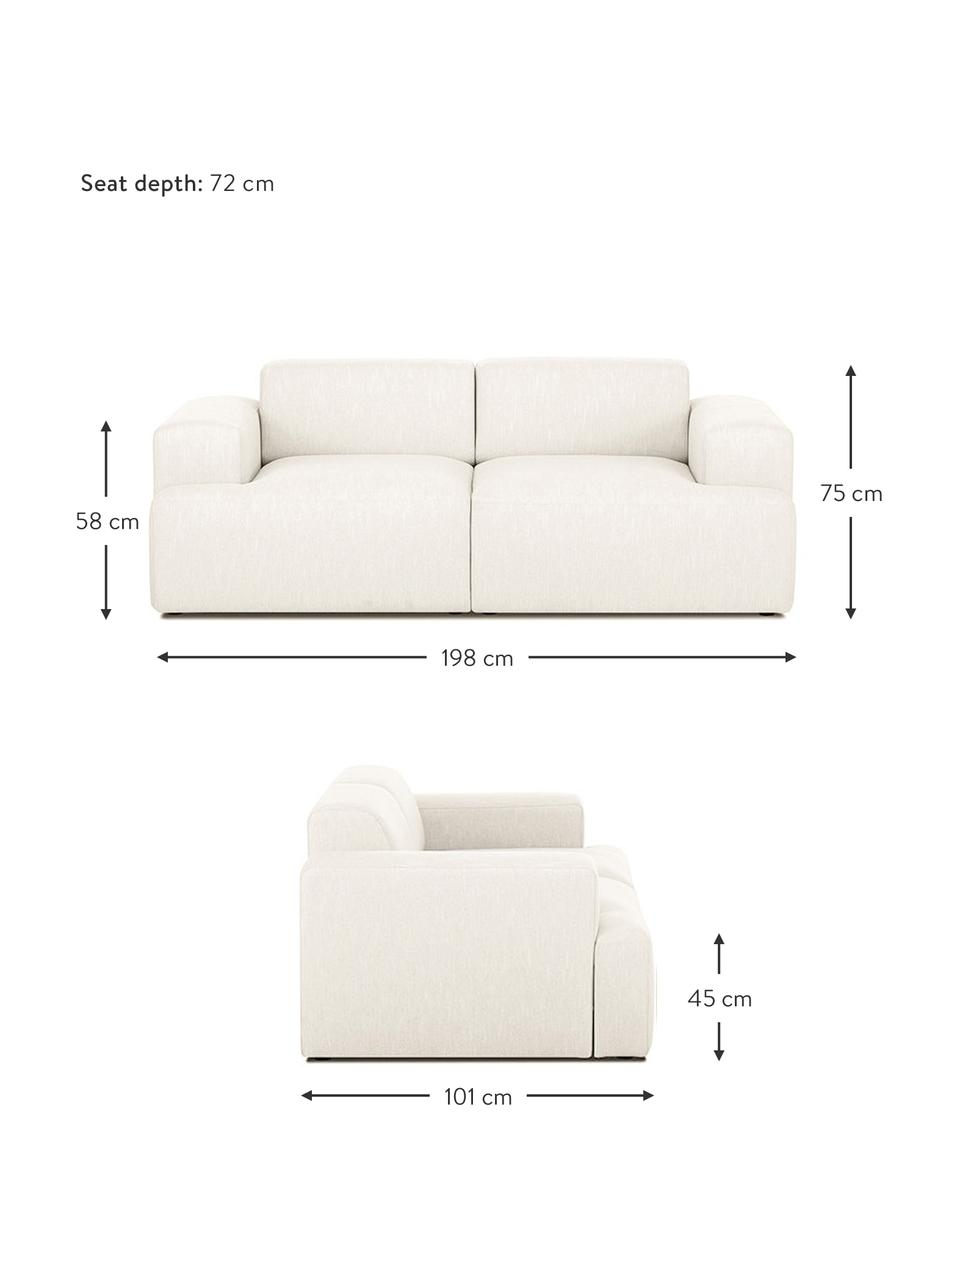 Bank Melva (2-zits) in beige, Bekleding: 100% polyester, Frame: massief grenenhout, FSC-g, Poten: kunststof, Geweven stof beige, 198 x 101 cm